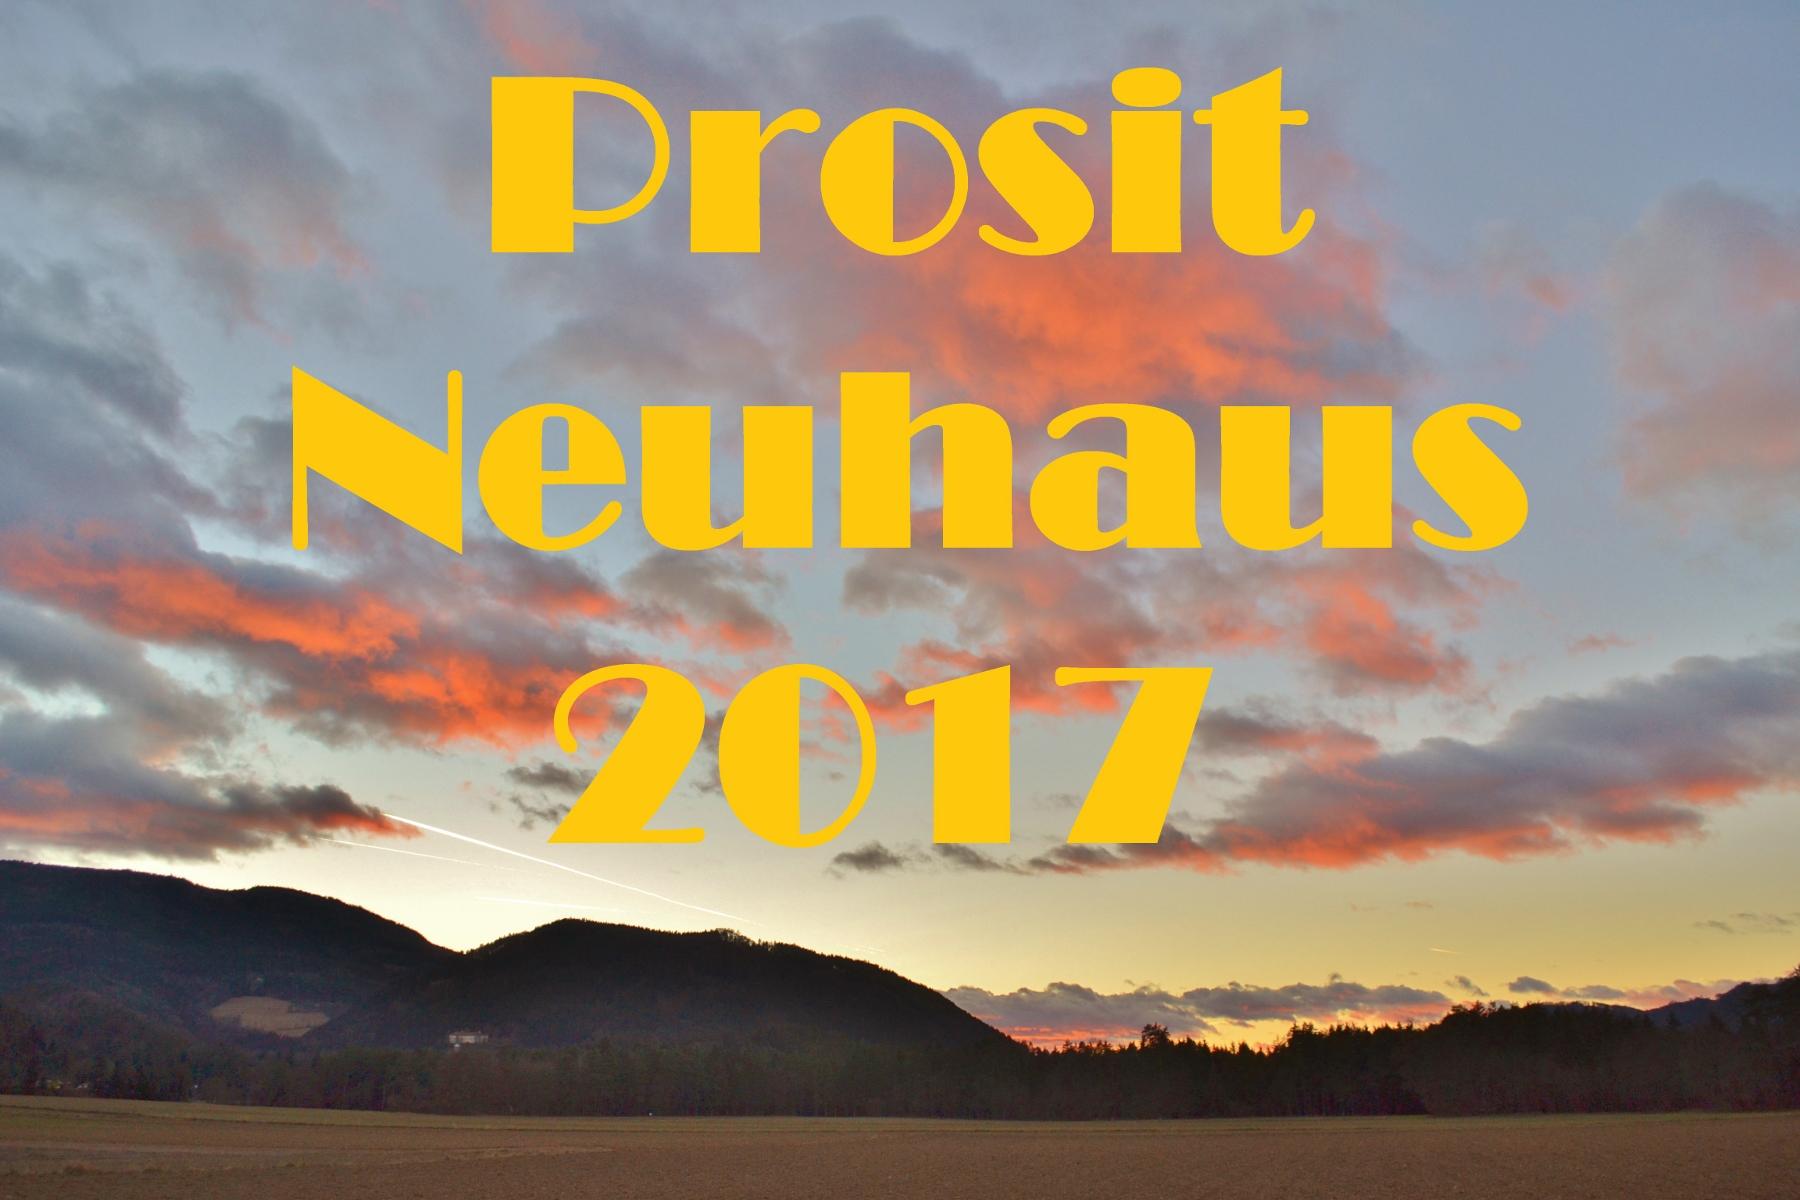 prosit2017-1800x1200